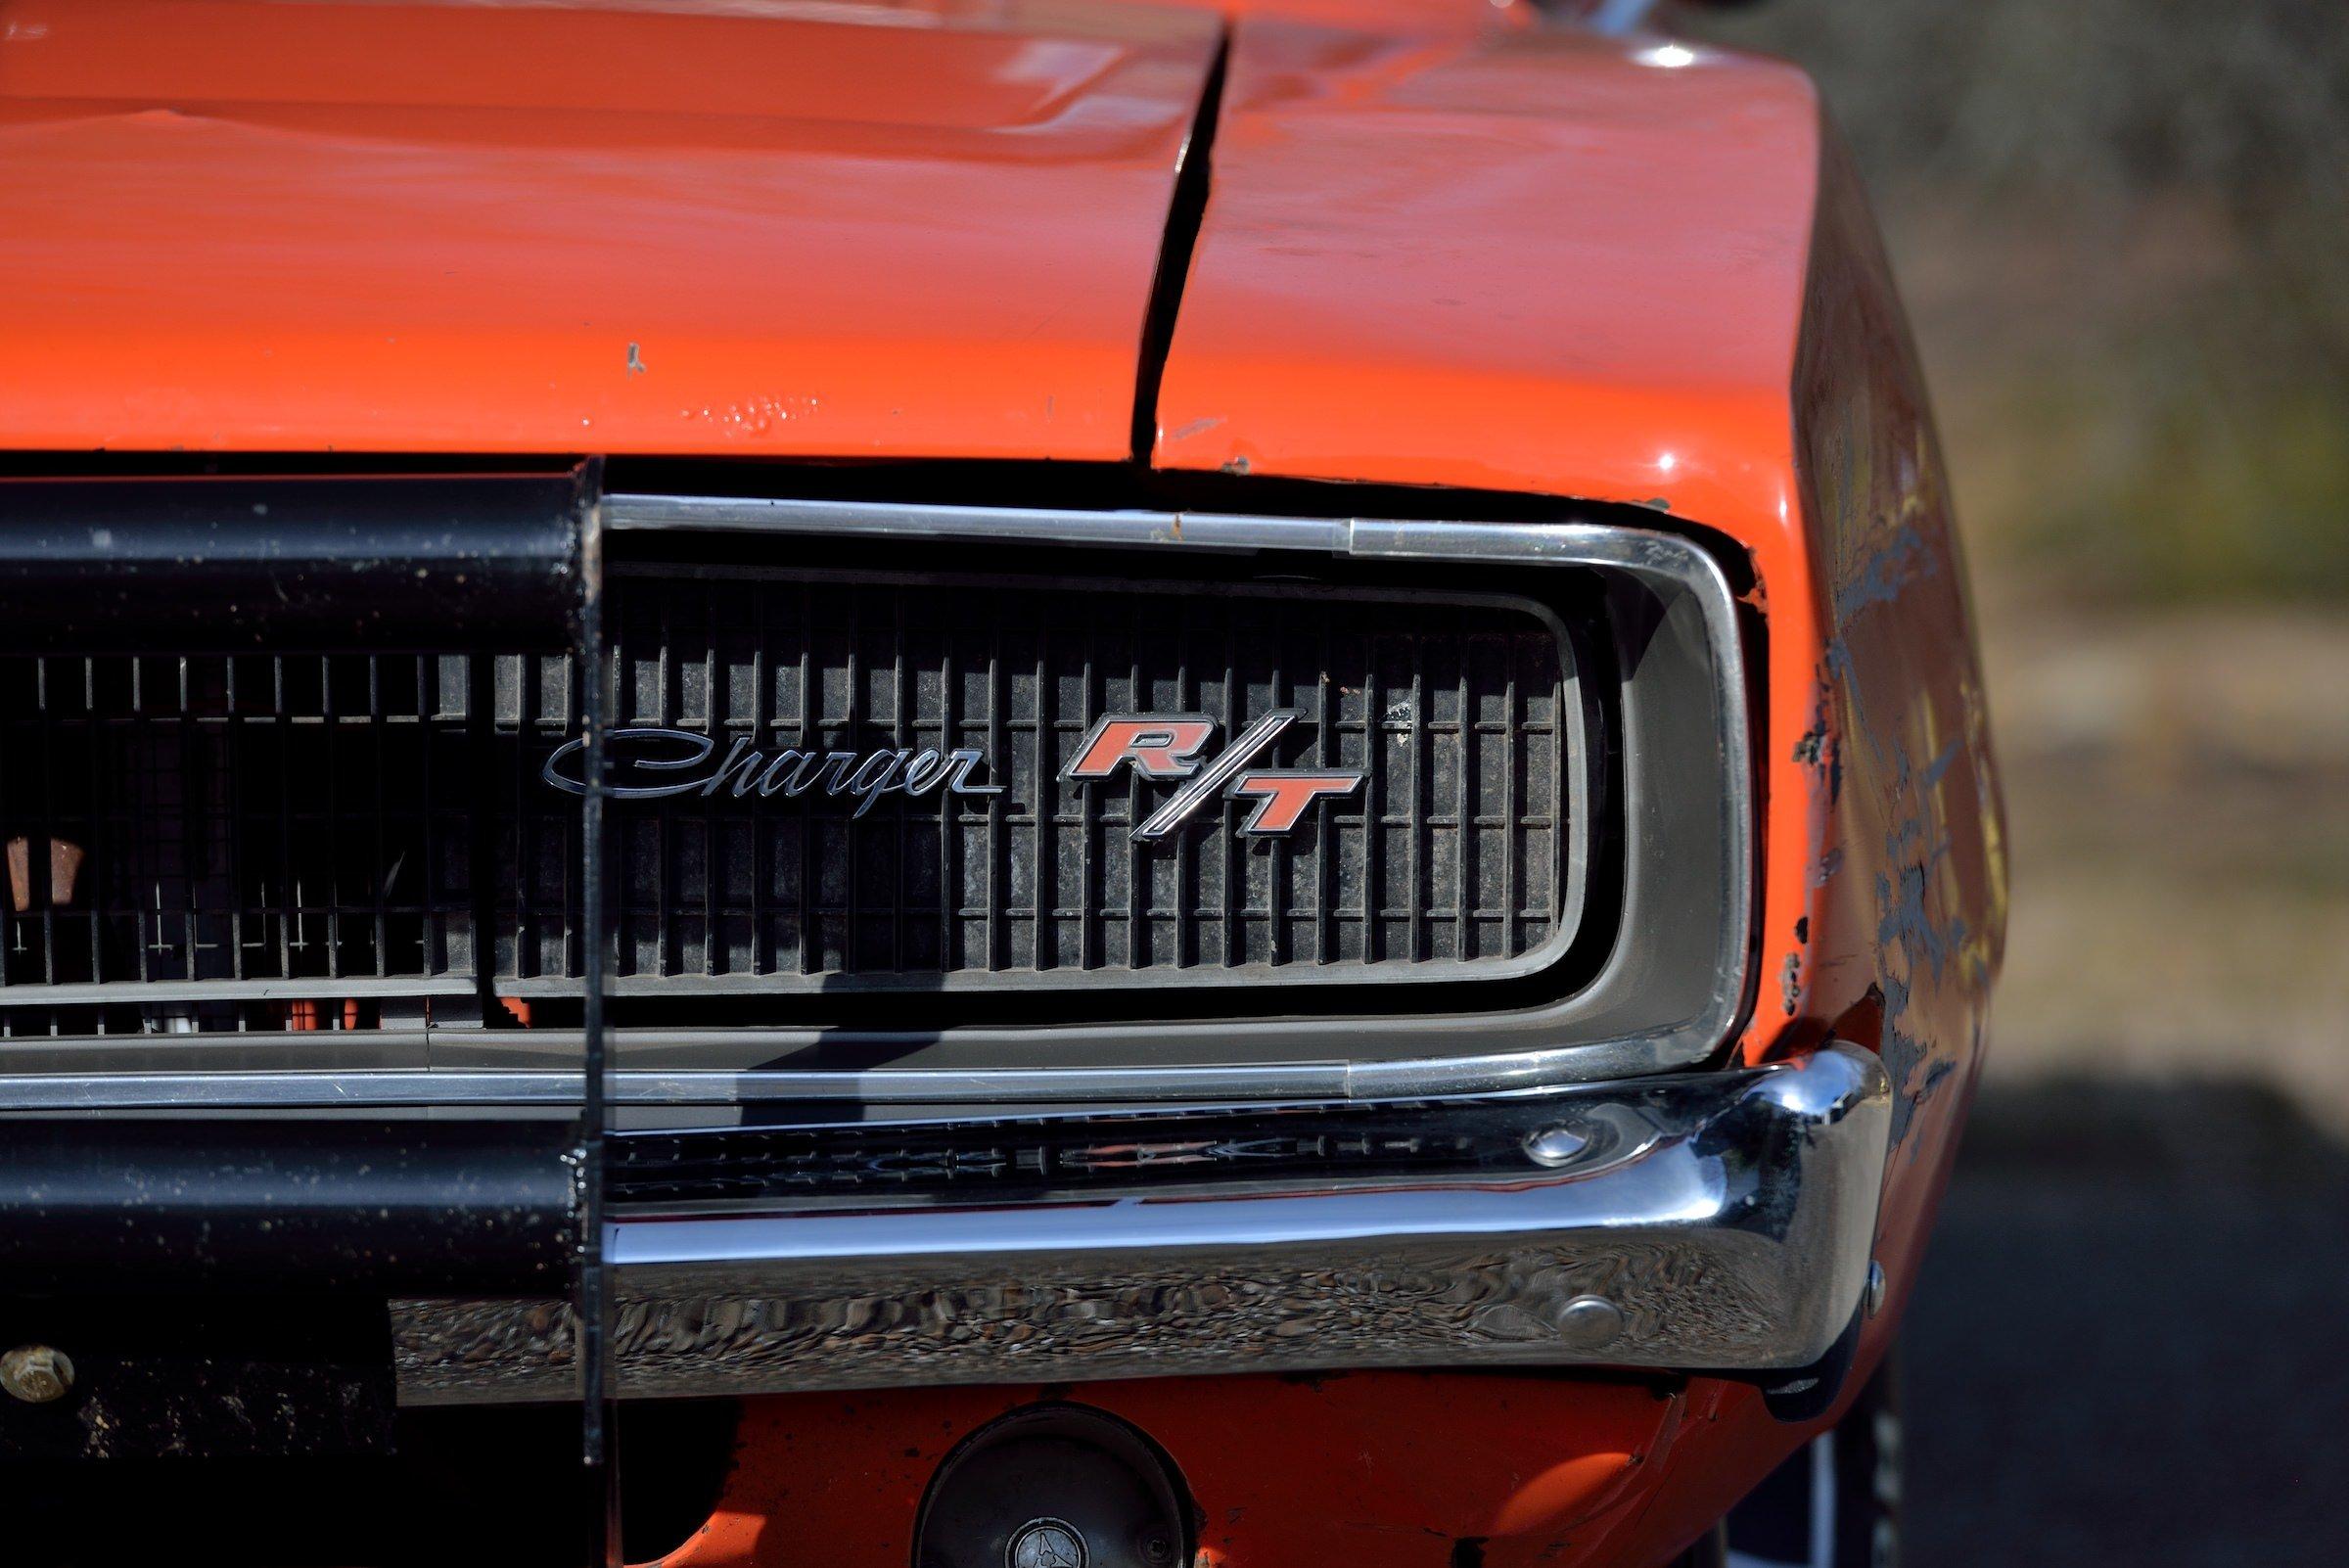 For Sale An Original Dukes Of Hazzard Movie Stunt Car